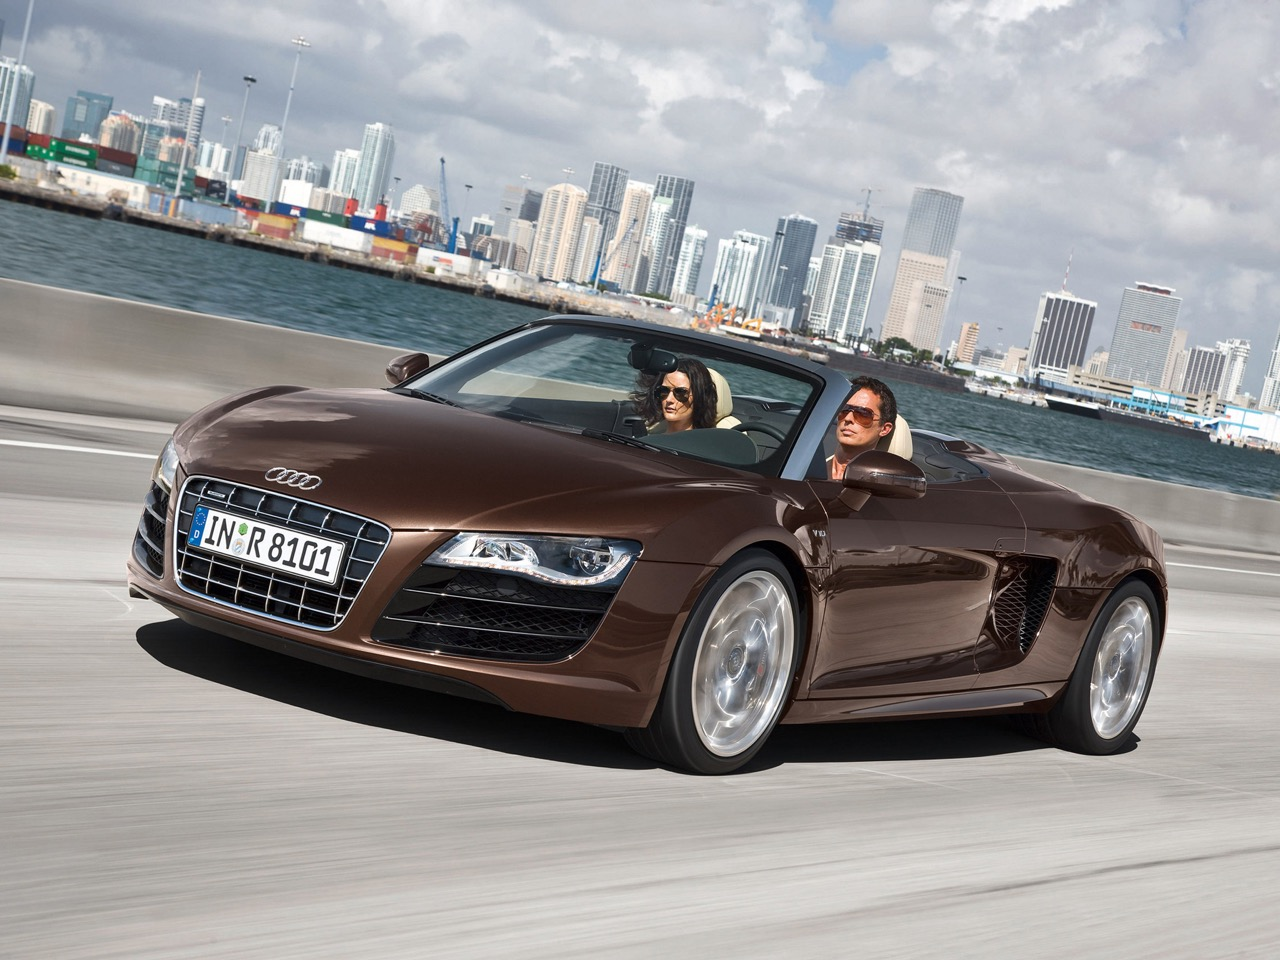 Audi R8 Spyder 2010